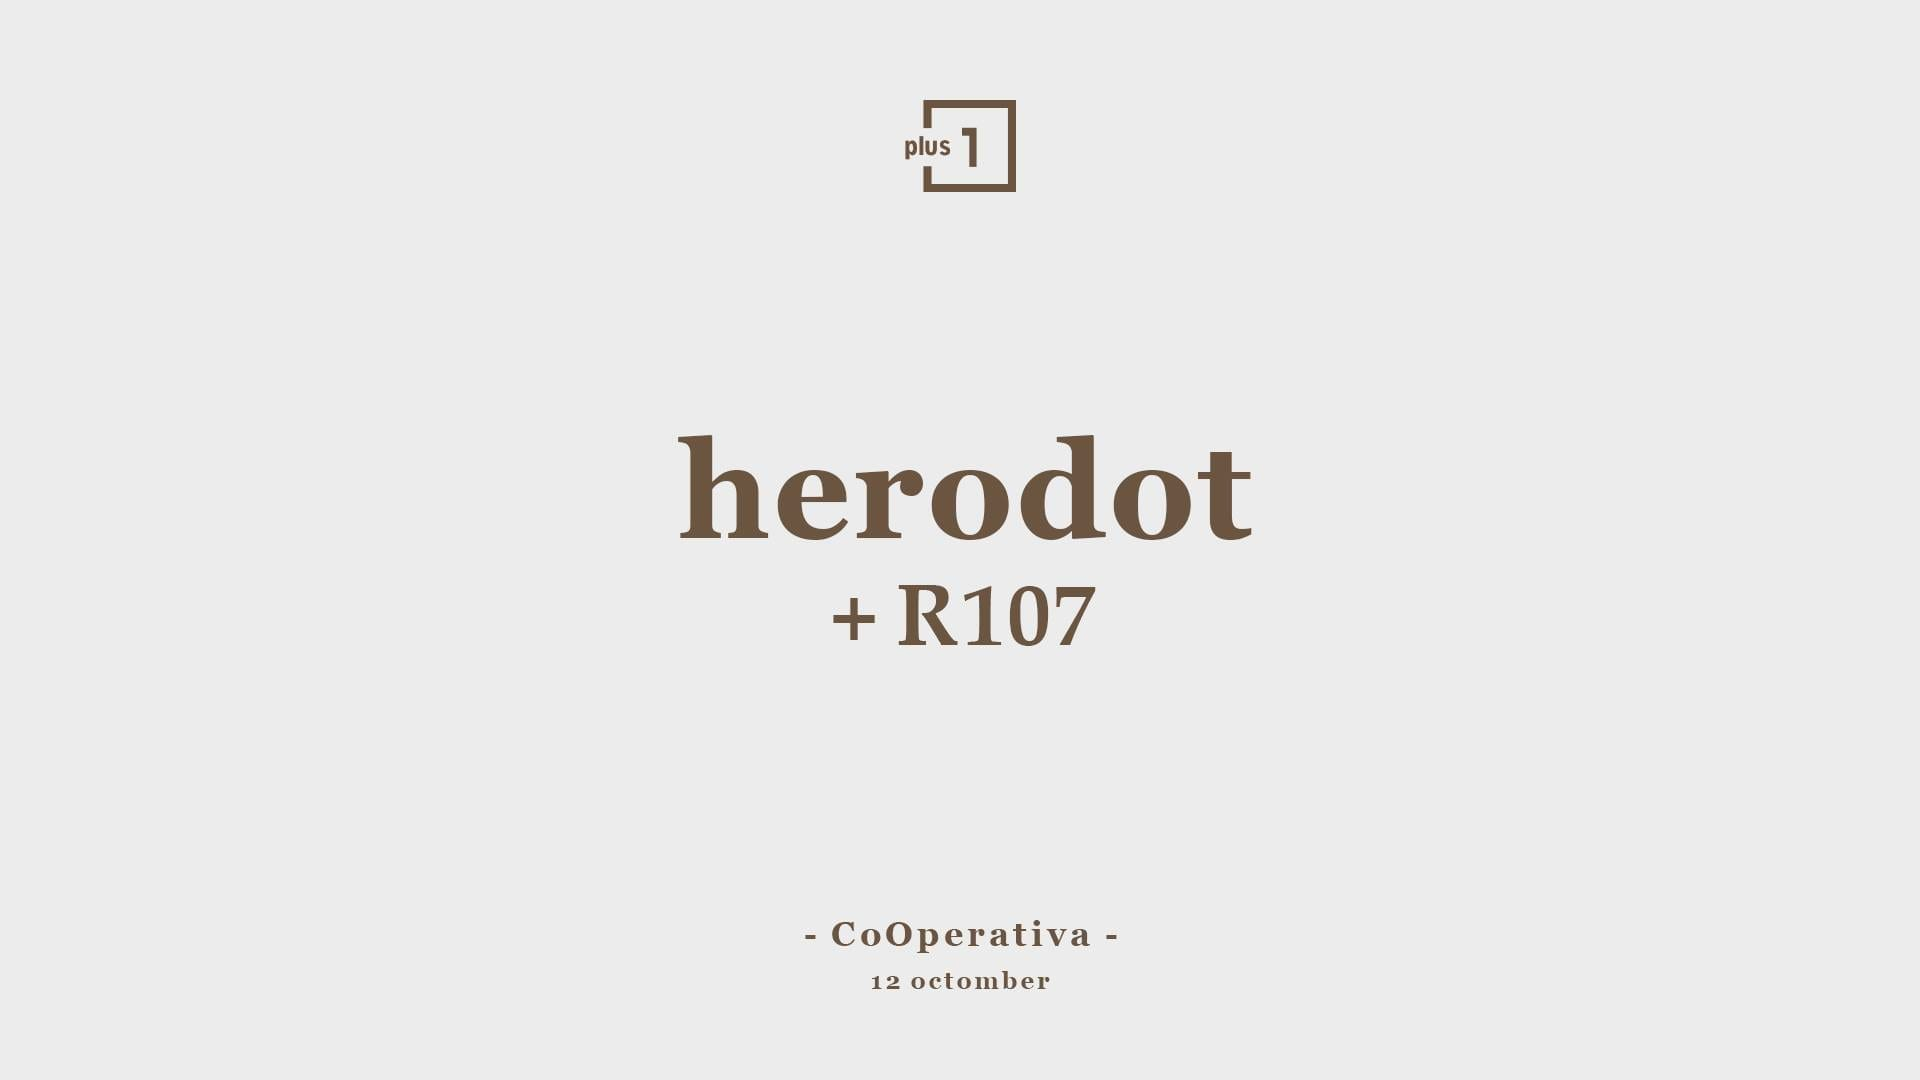 Herodot + R107